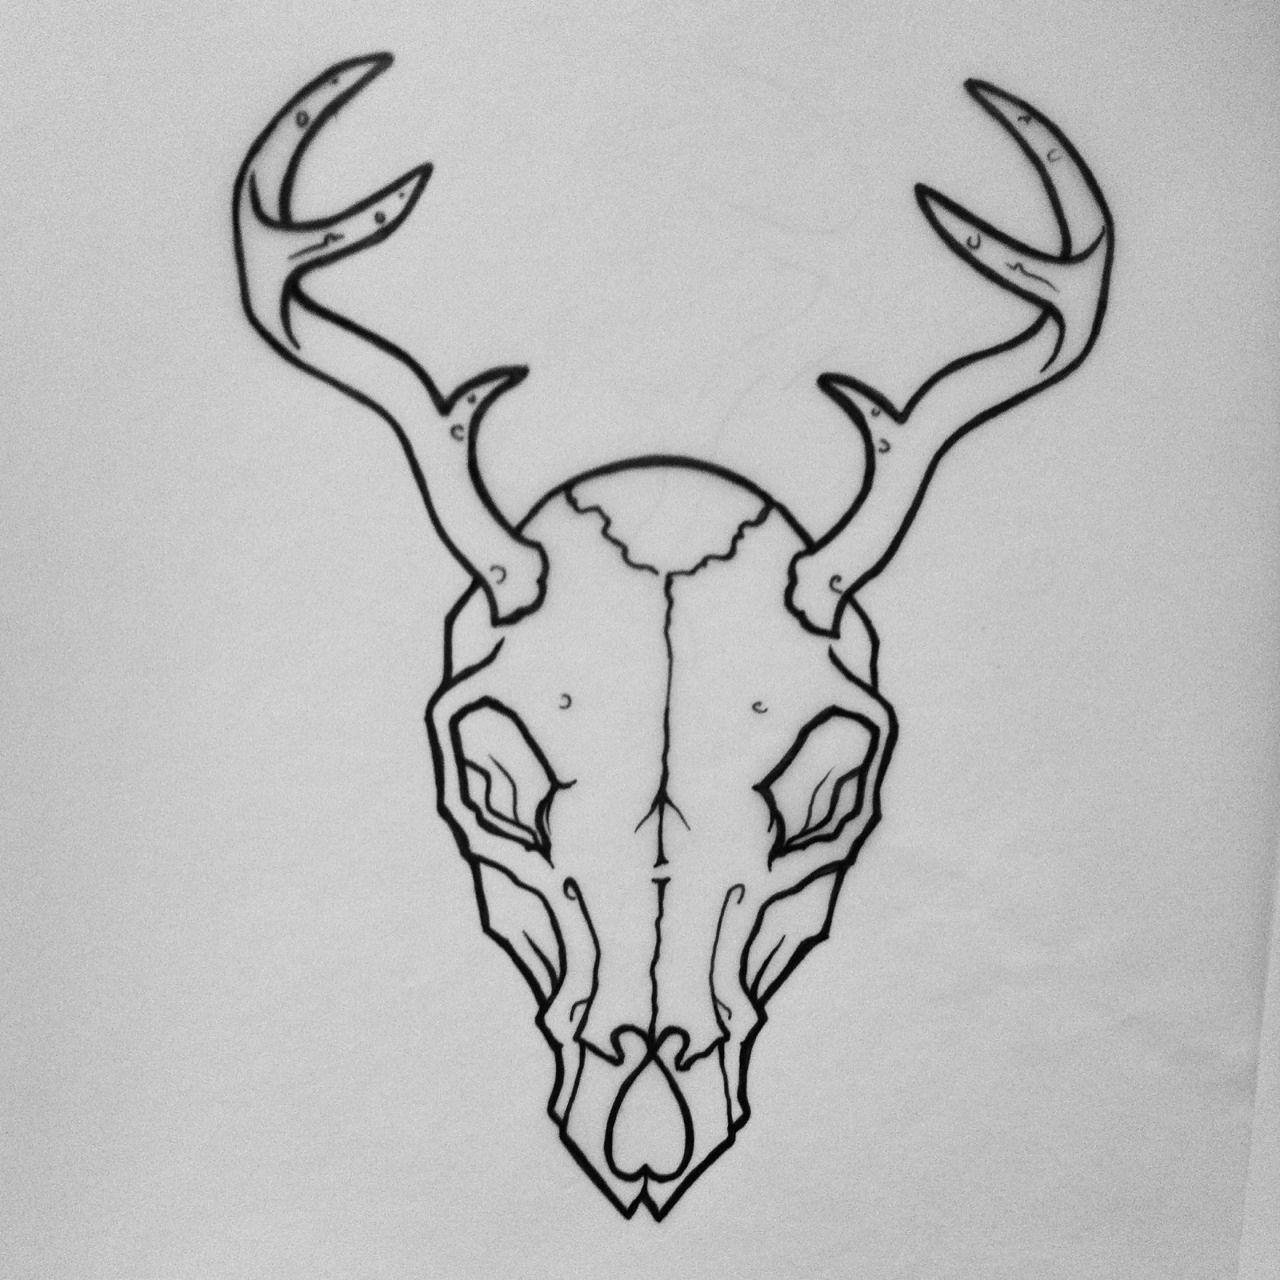 deer skull tattoos tumblr - Google Search | TATTOOS ...